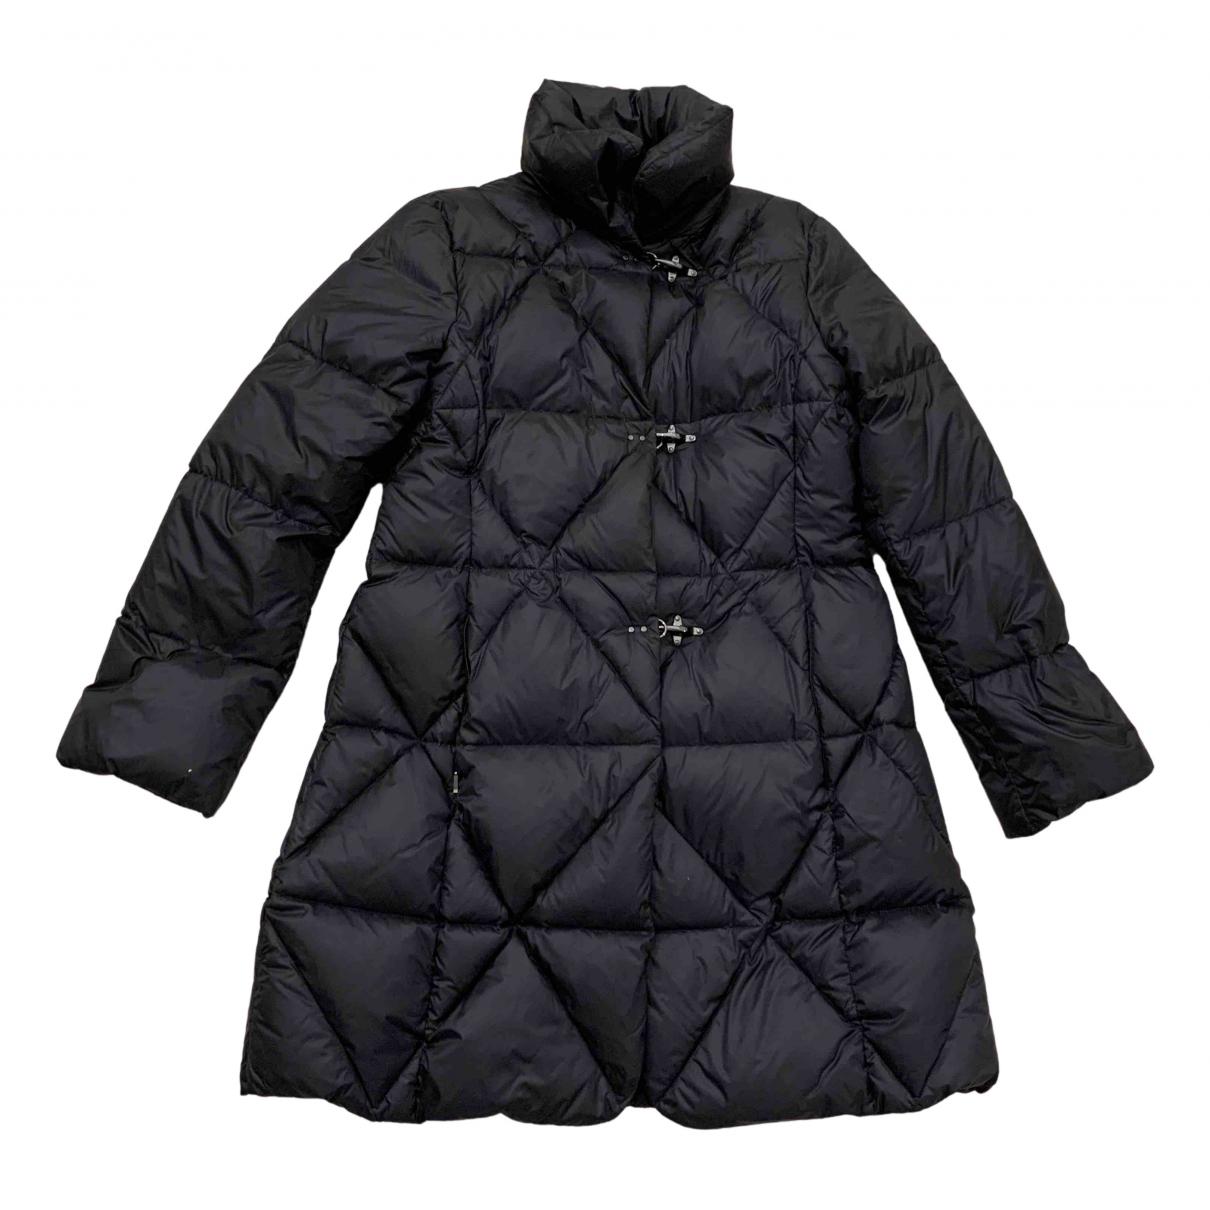 Fay N Black coat for Women XXL International